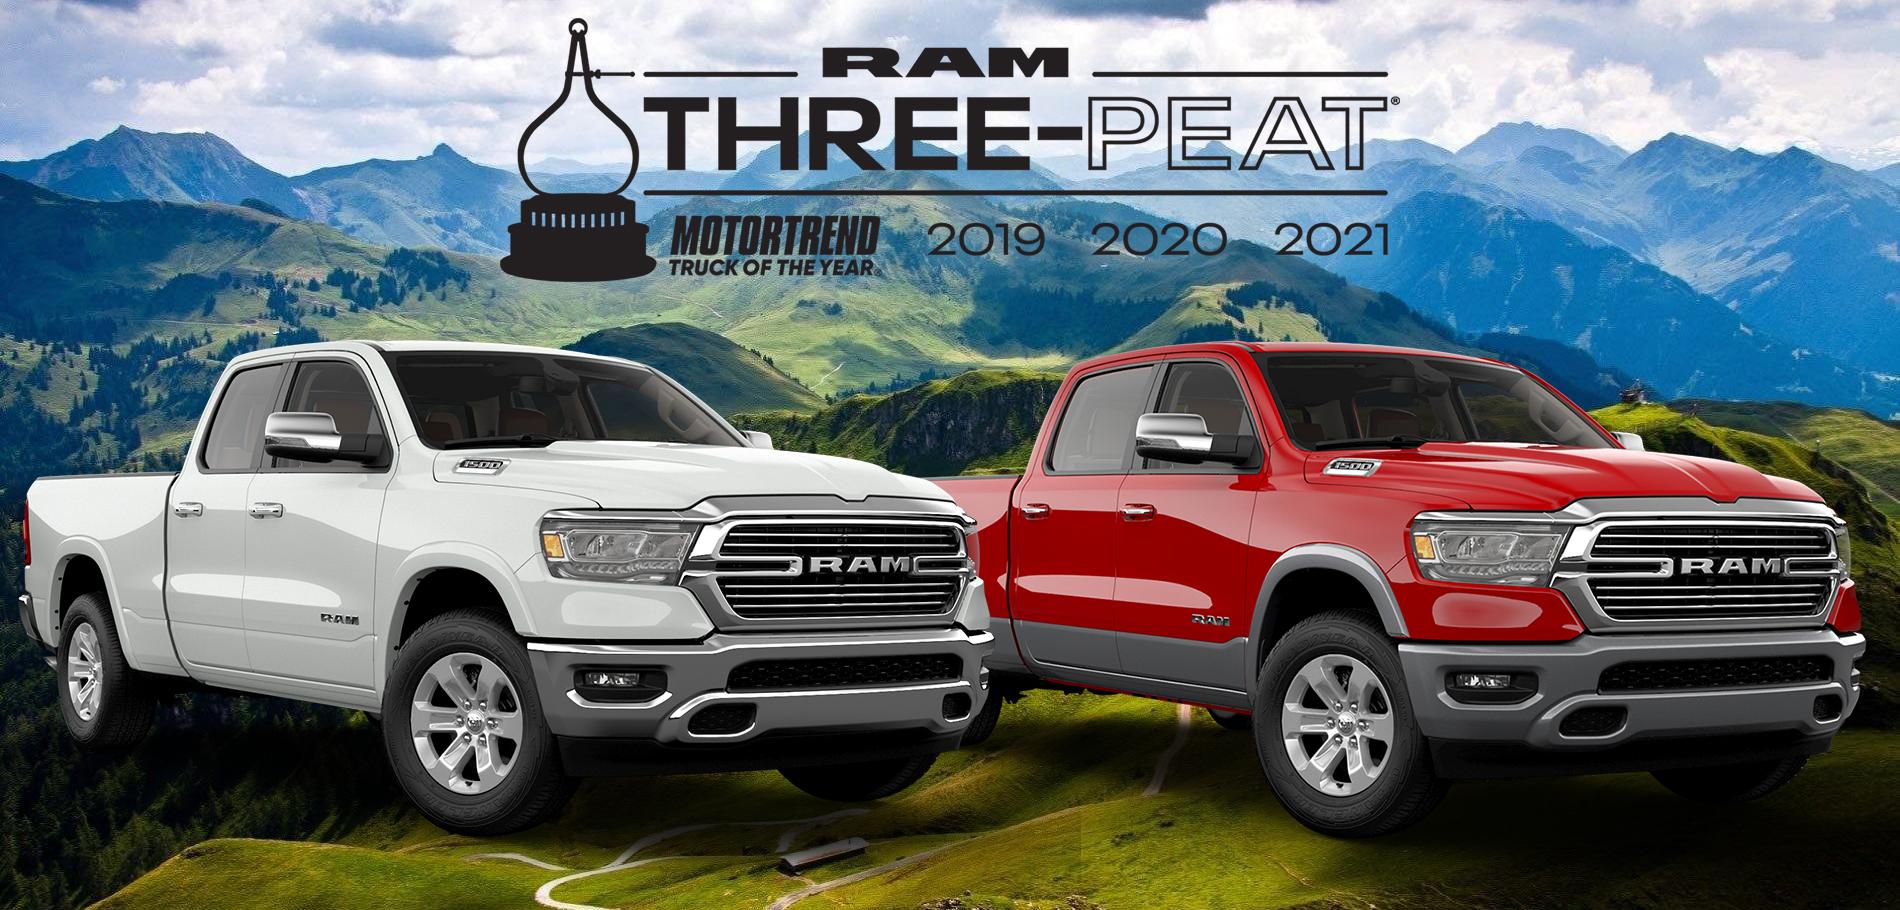 2021 Three-Peat RAM